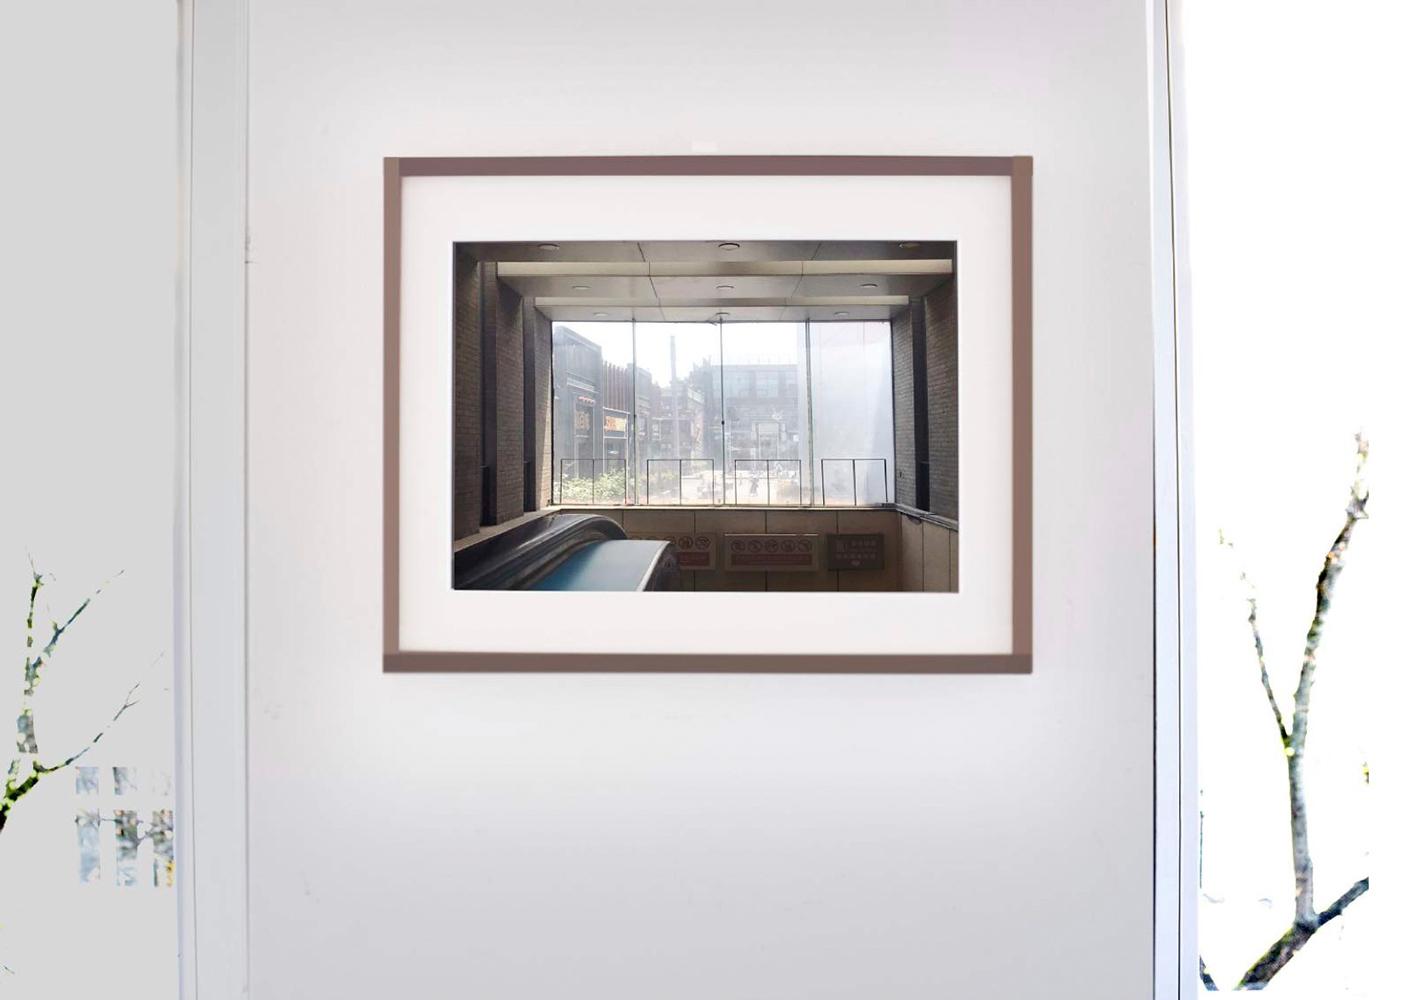 © Anna Lehmann-Brauns, Installation View, Beijing Series, U-Bahn